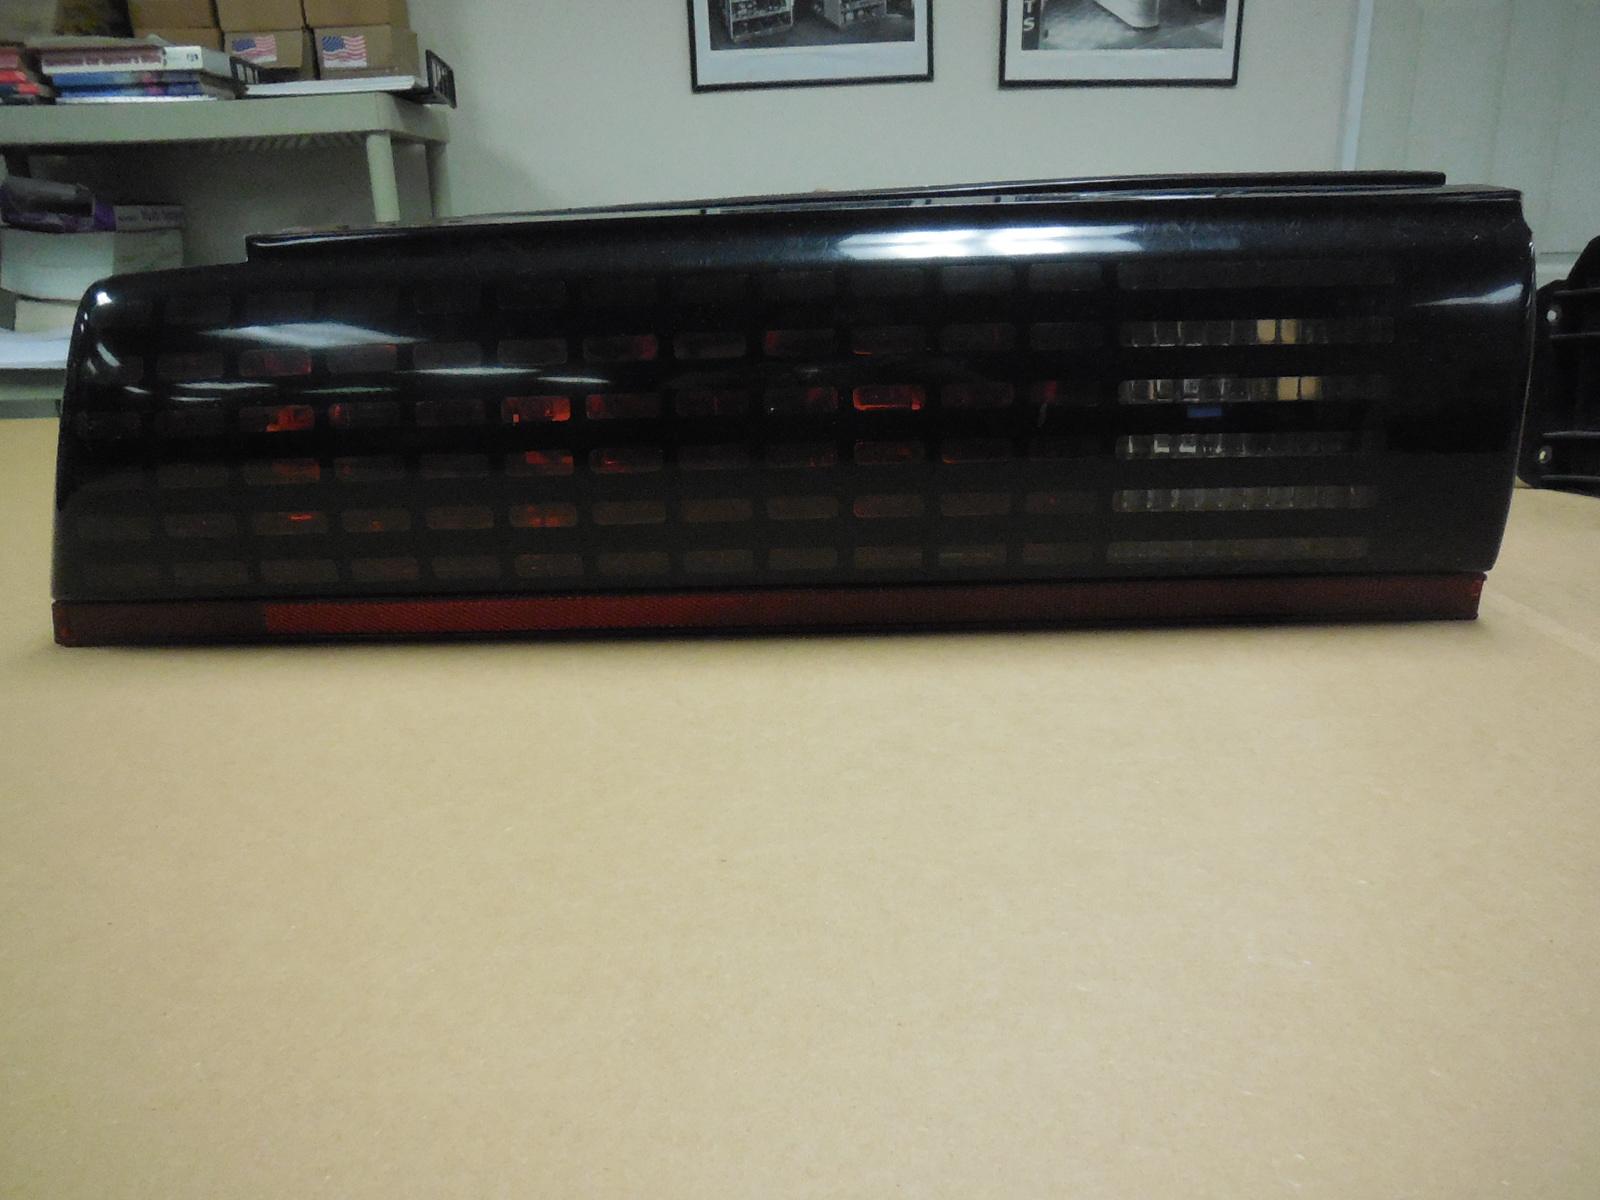 1985, 1986, 1987, 1988, 1989, 1990, Trans Am, Firebird, Left, Right, Tail, lights, with, center, Filler, Panel